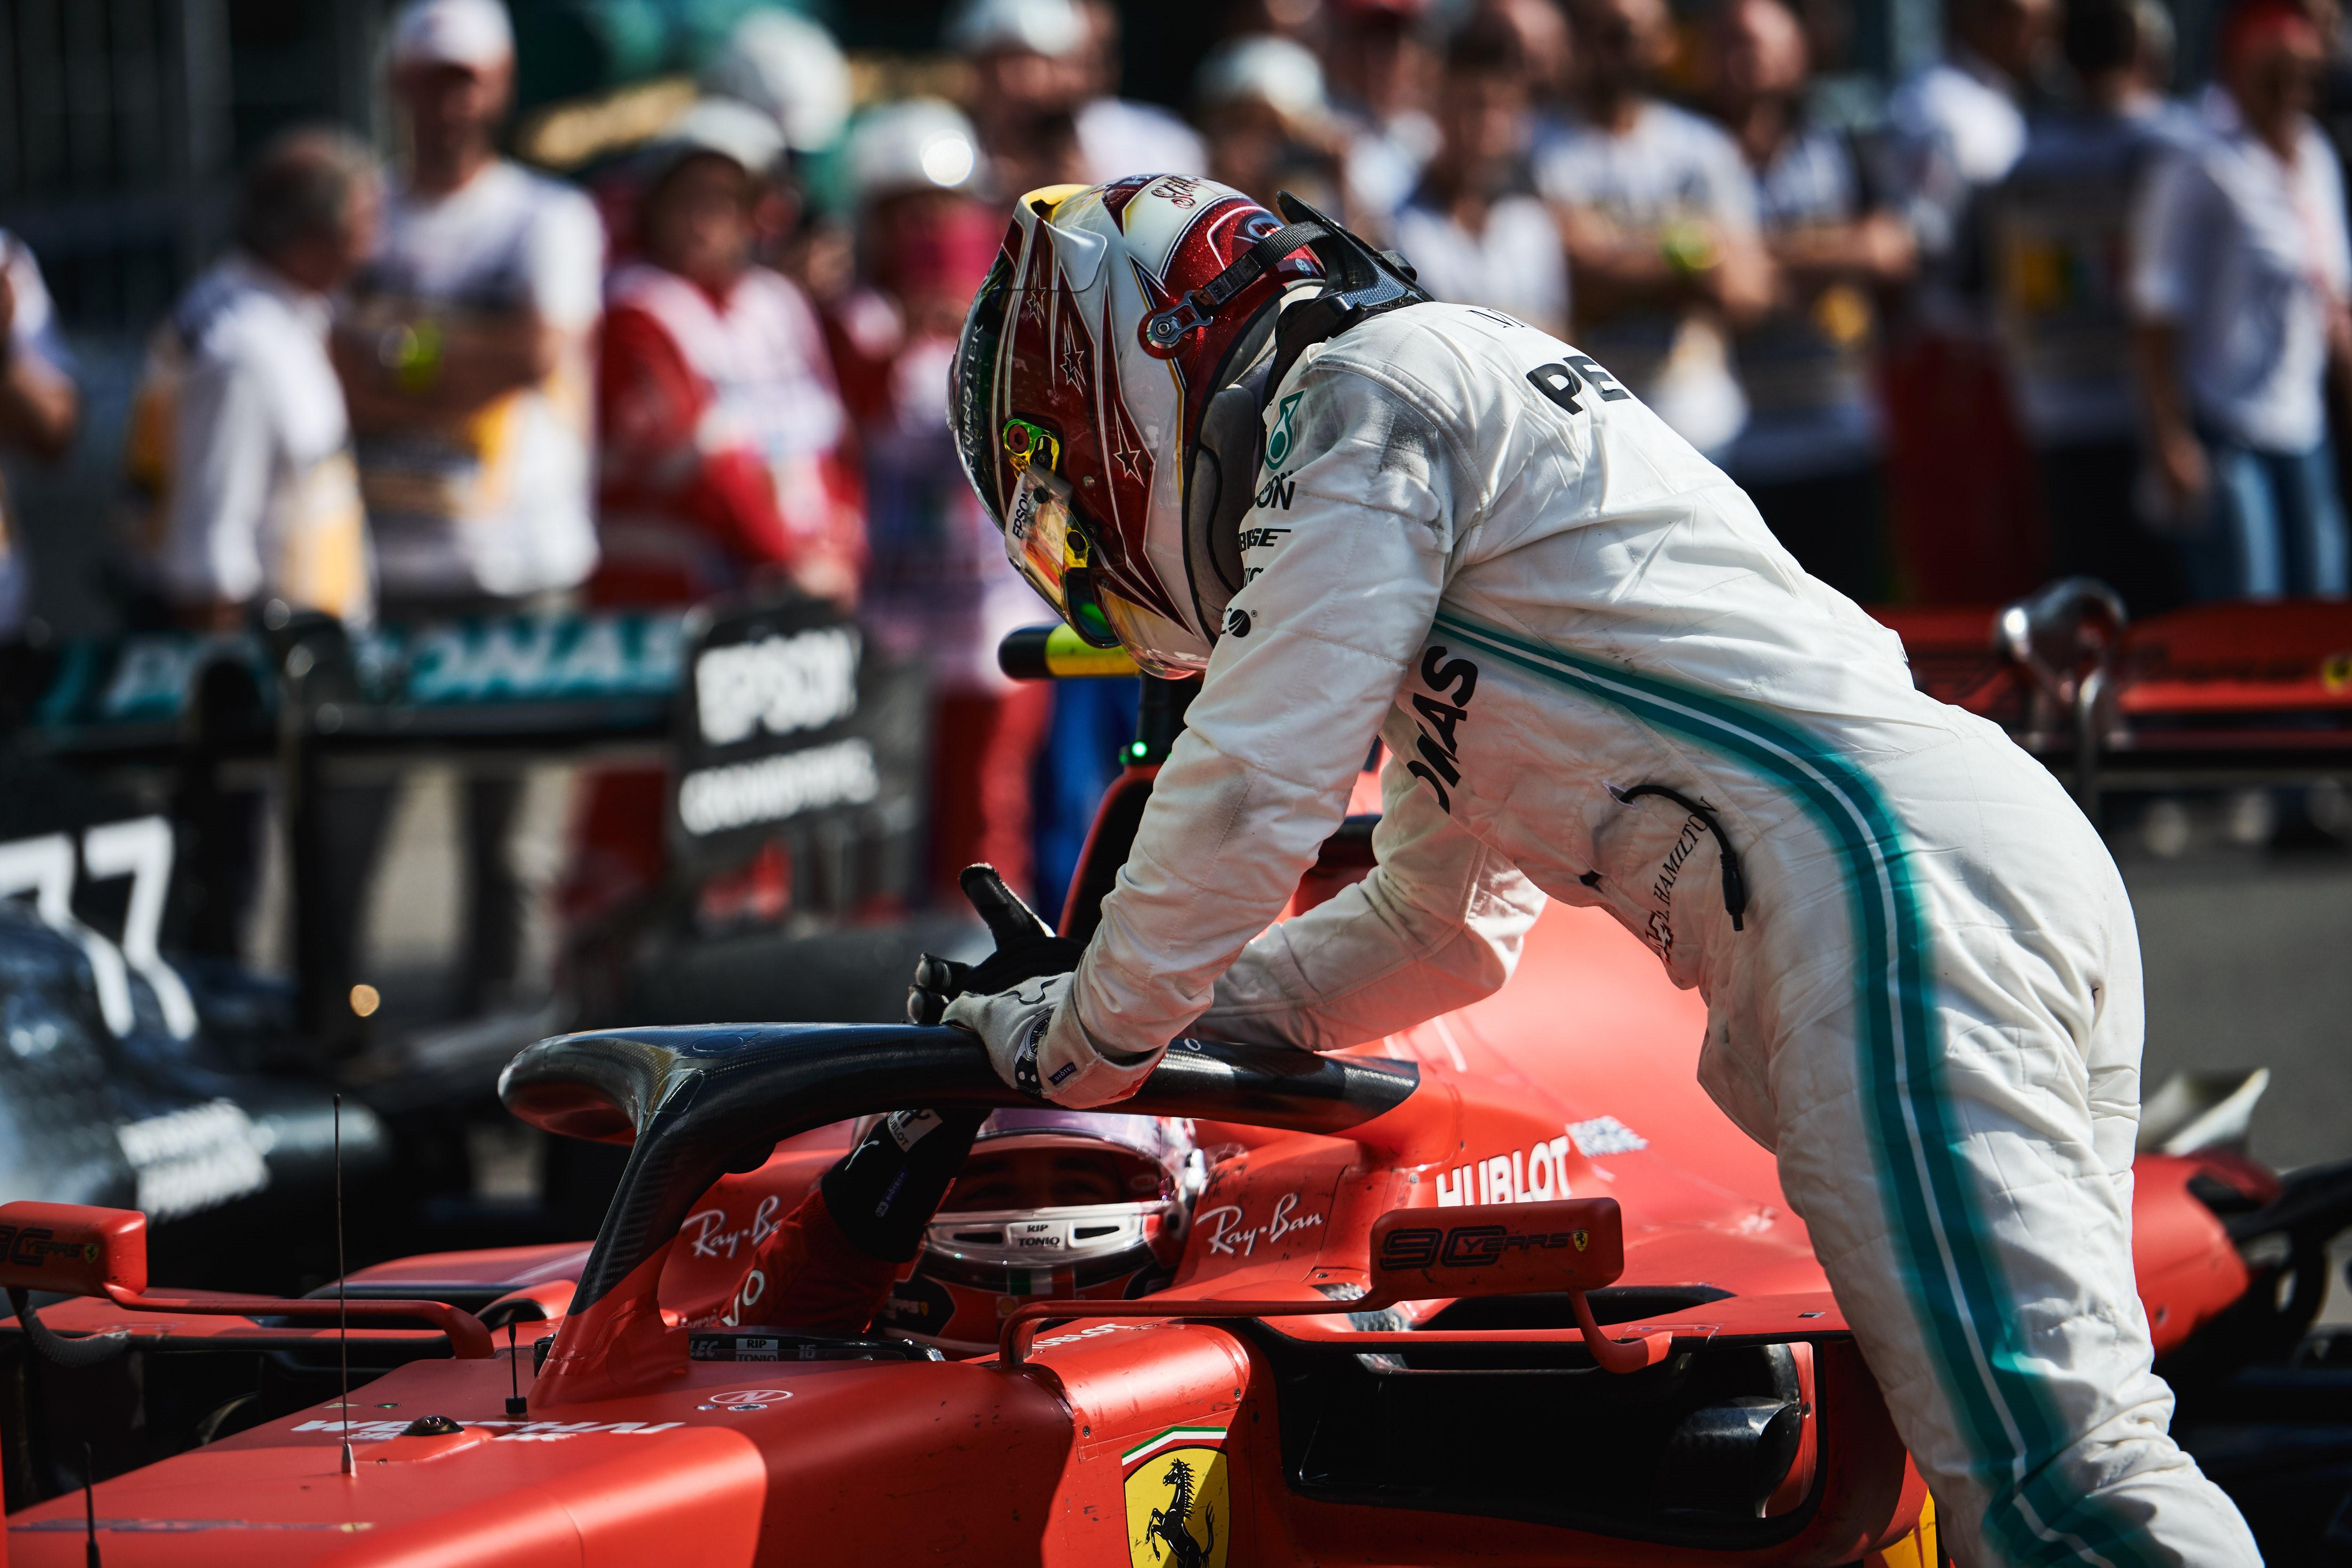 Lewis Hamilton (Mercedes), Charles Leclerc (Ferrari) au Grand Prix d'Italie 2019